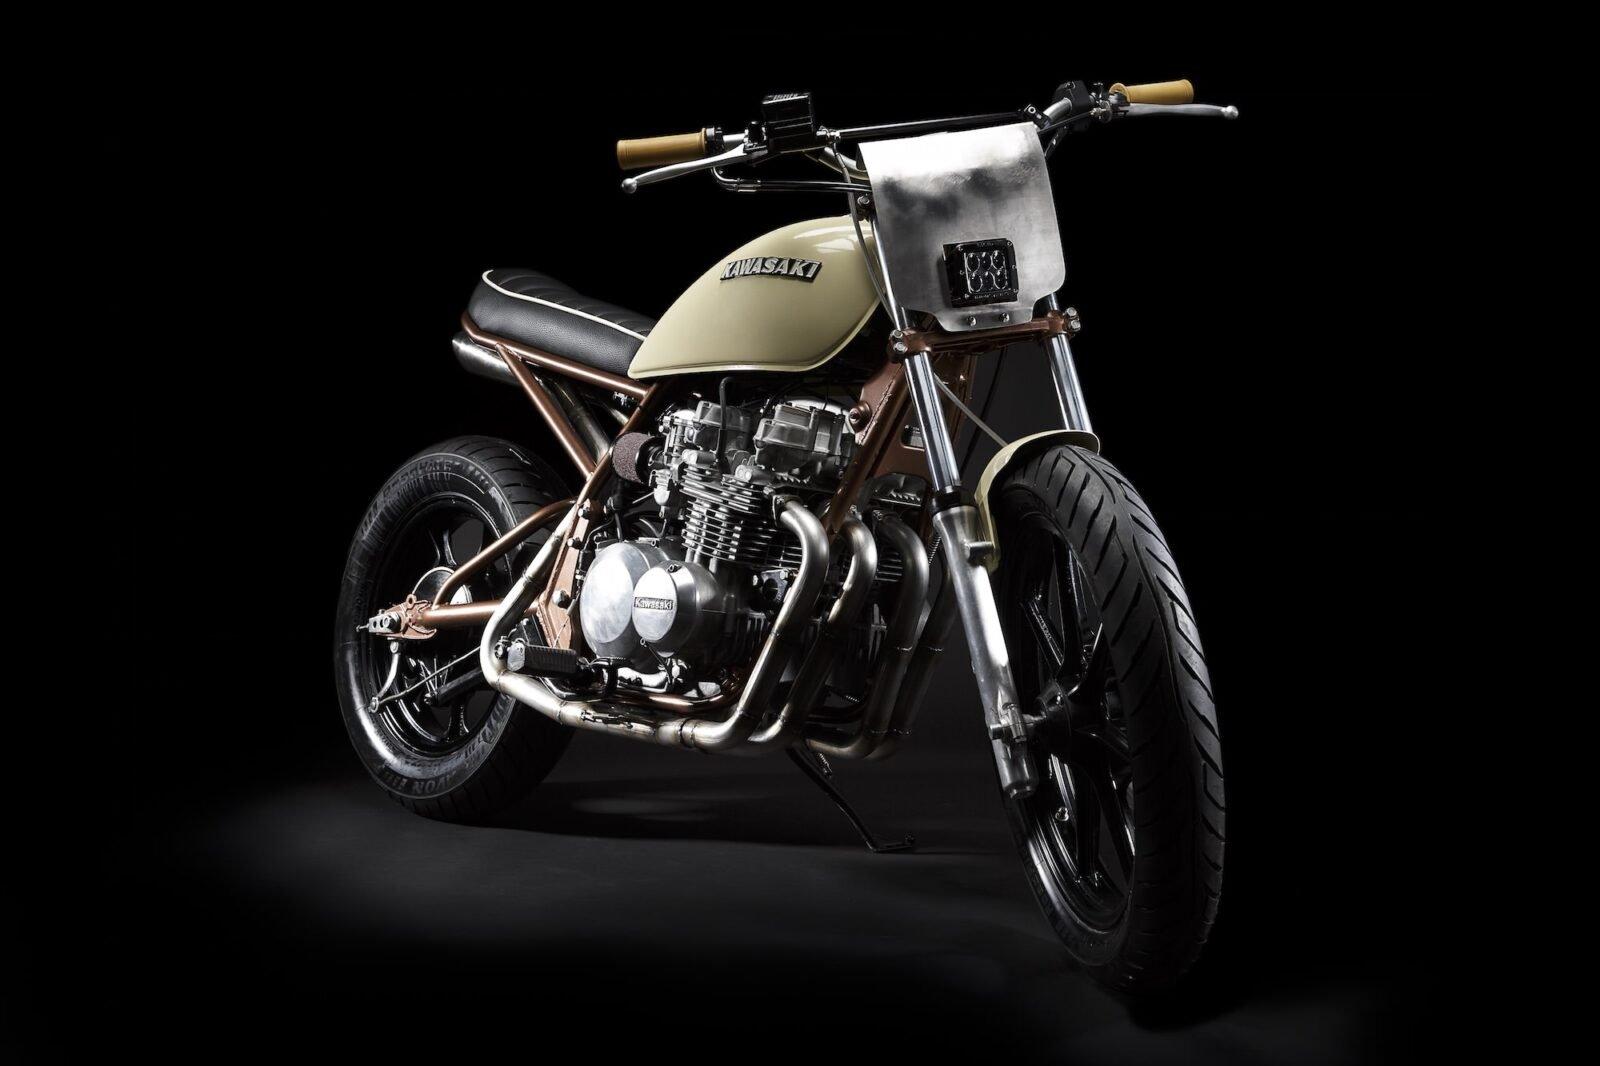 Kawasaki KZ550 by No. 8 Wire Motorcycles